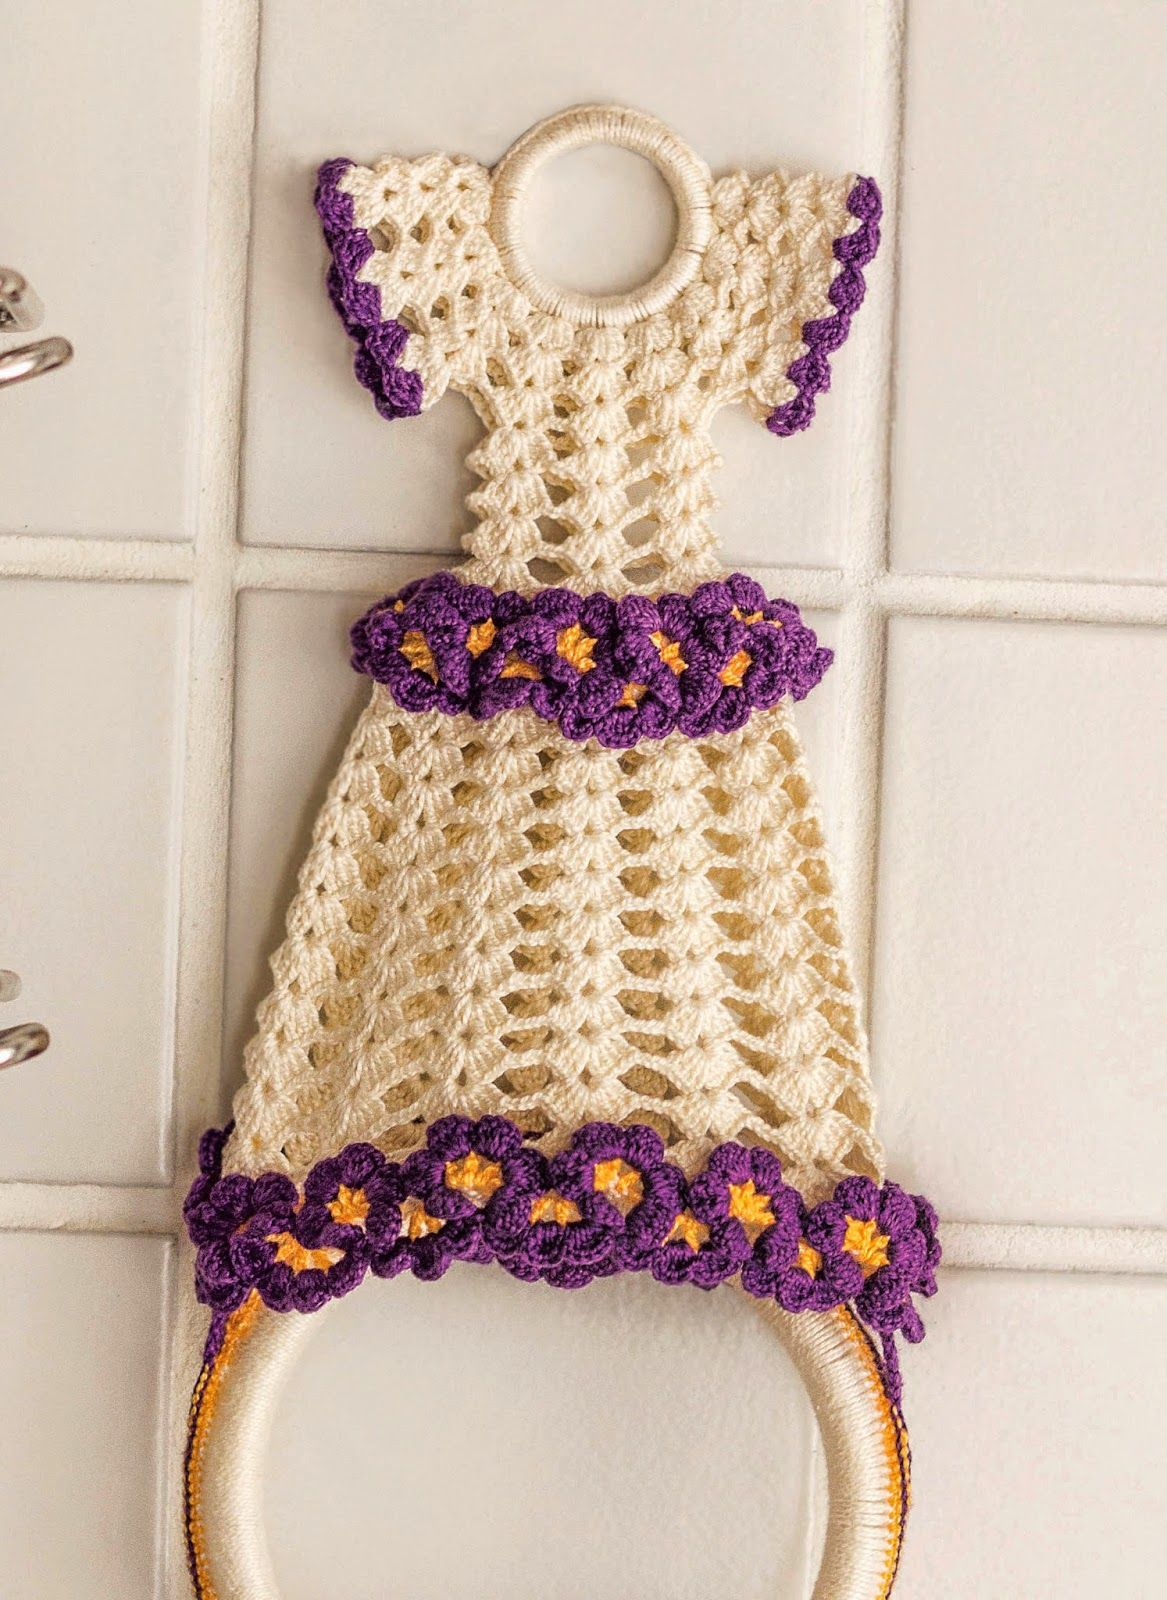 PAP da Vitrine do Artesanato: http://artesanatov.blogspot.com.br/2014/06/crocheterapia.html